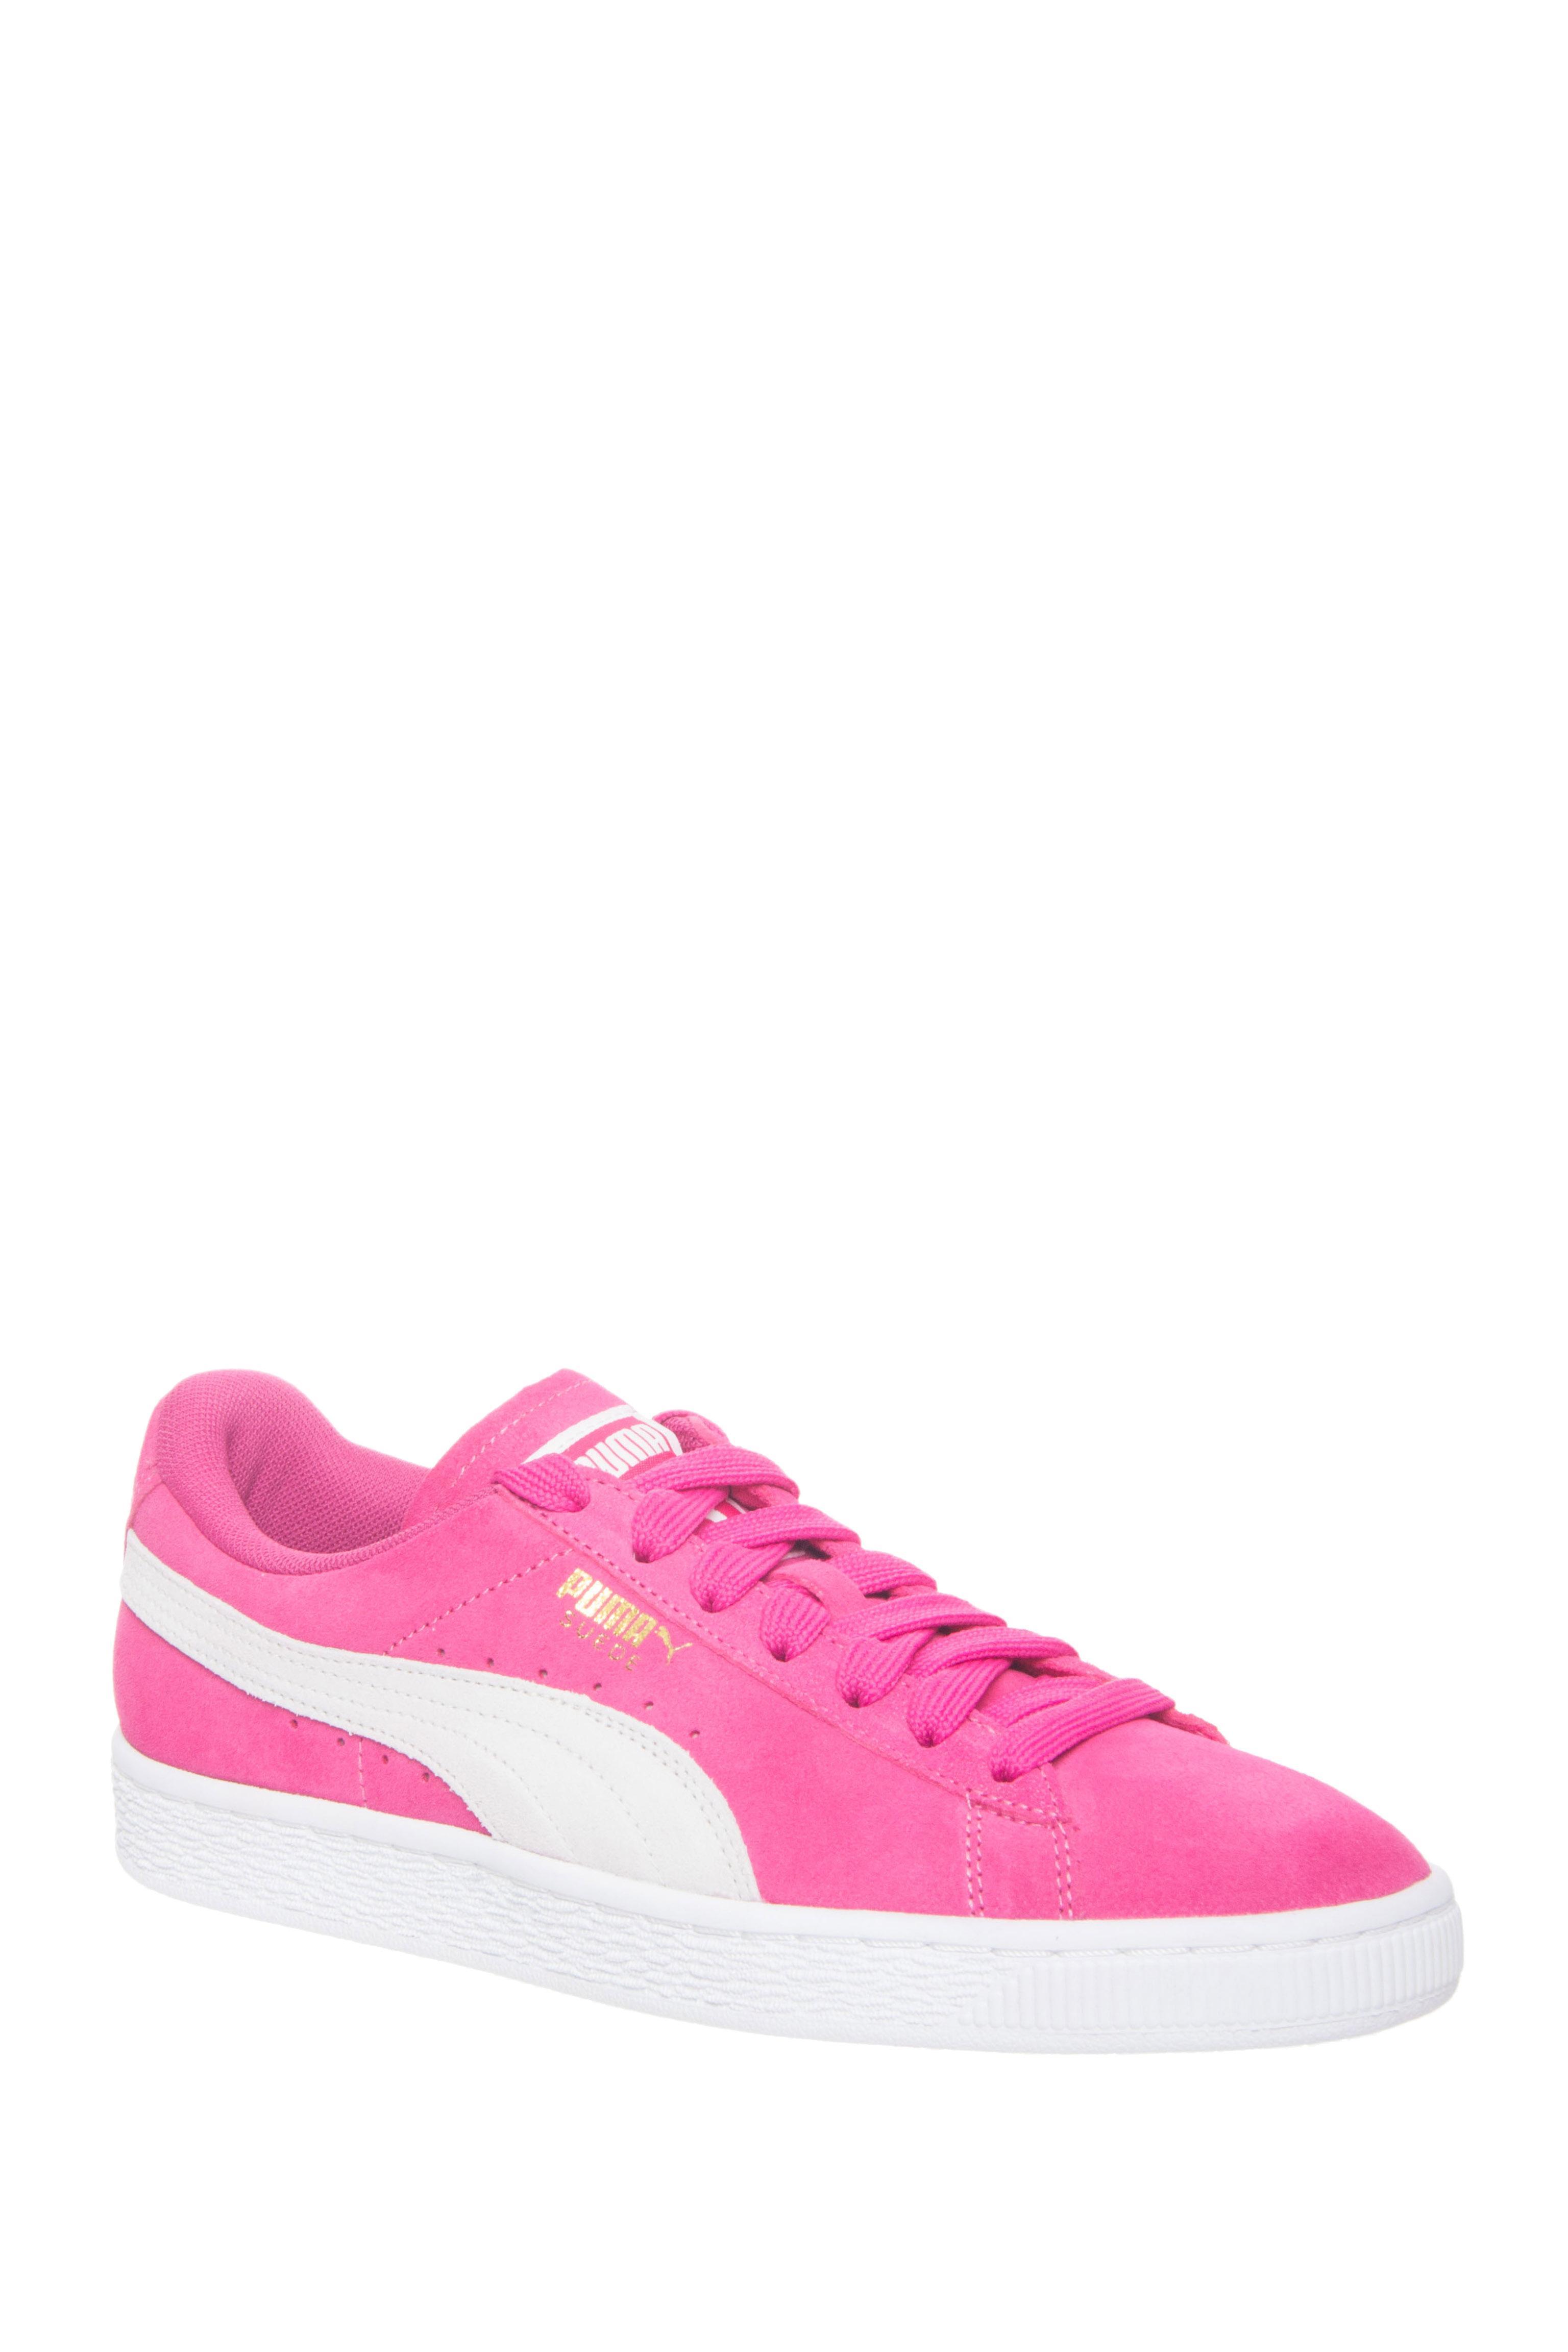 Puma Suede Classic Low Top Sneakers - Fuchsia